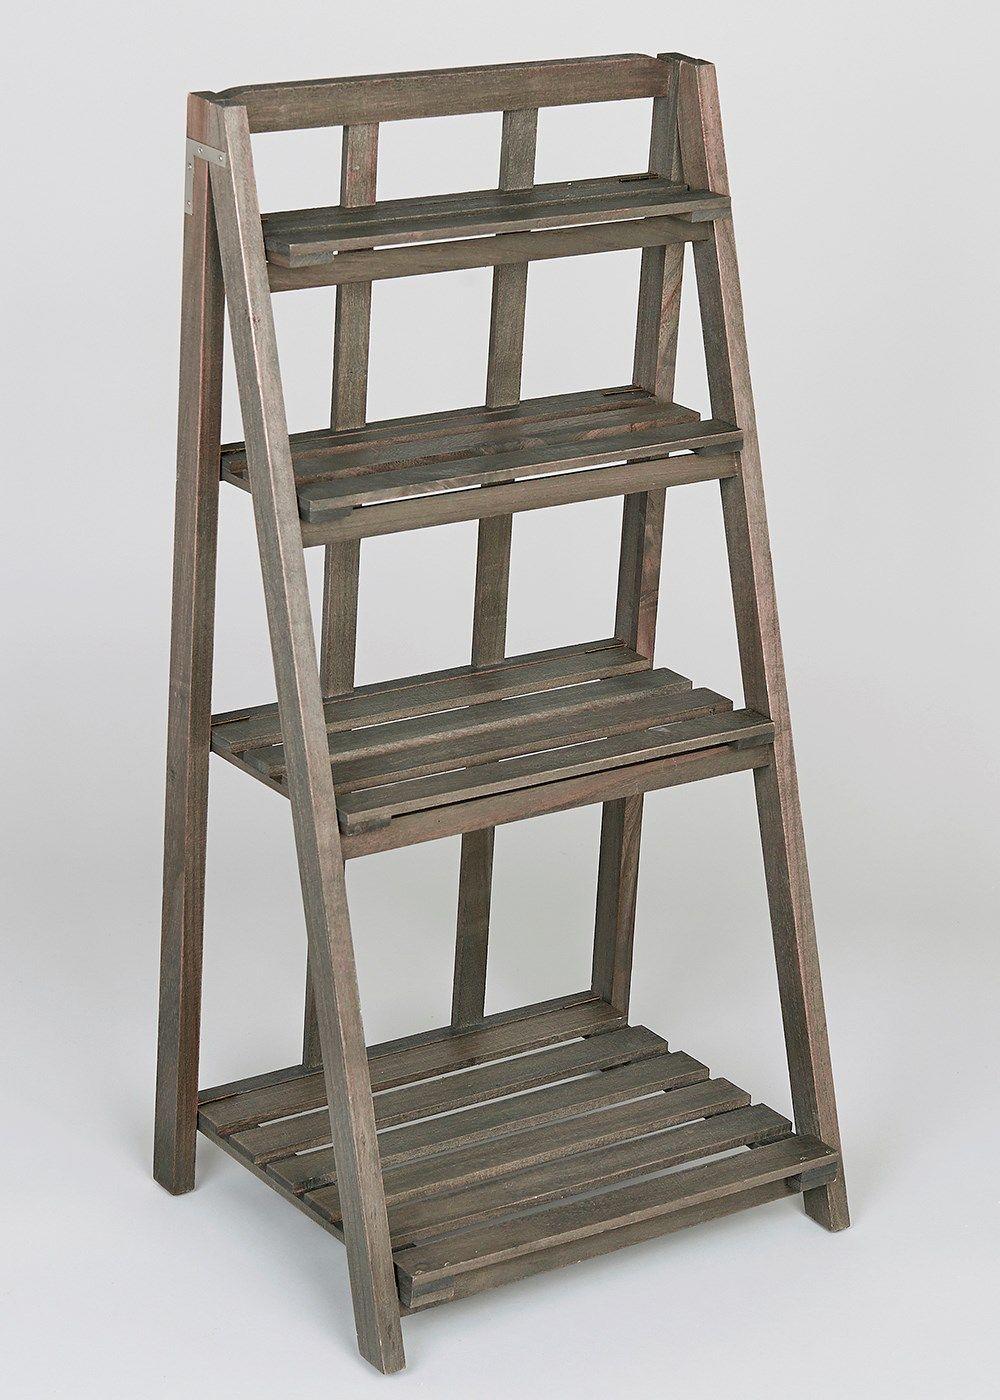 Slatted Bathroom Shelving Ladder Unit (40cm x 30cm x 80cm) - Matalan & Slatted Bathroom Shelving Ladder Unit (40cm x 30cm x 80cm) - Matalan ...